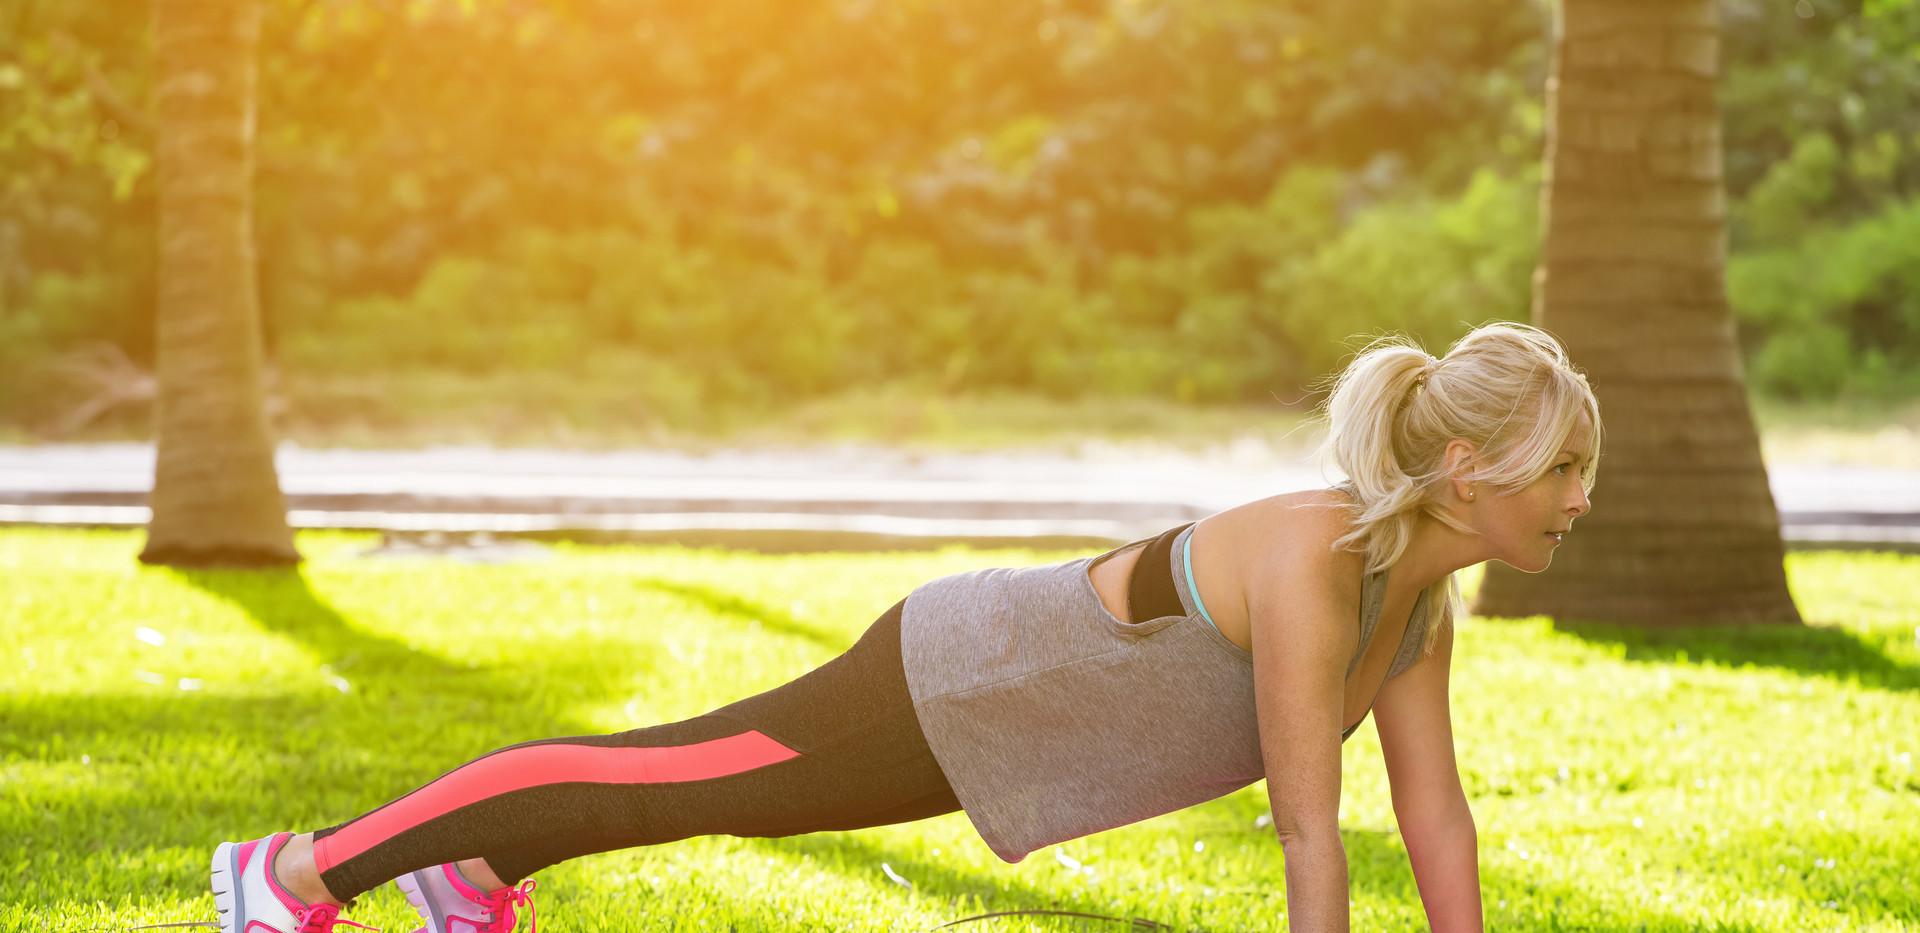 HD Planche Yoga Uccle, Pilates, Stretchi